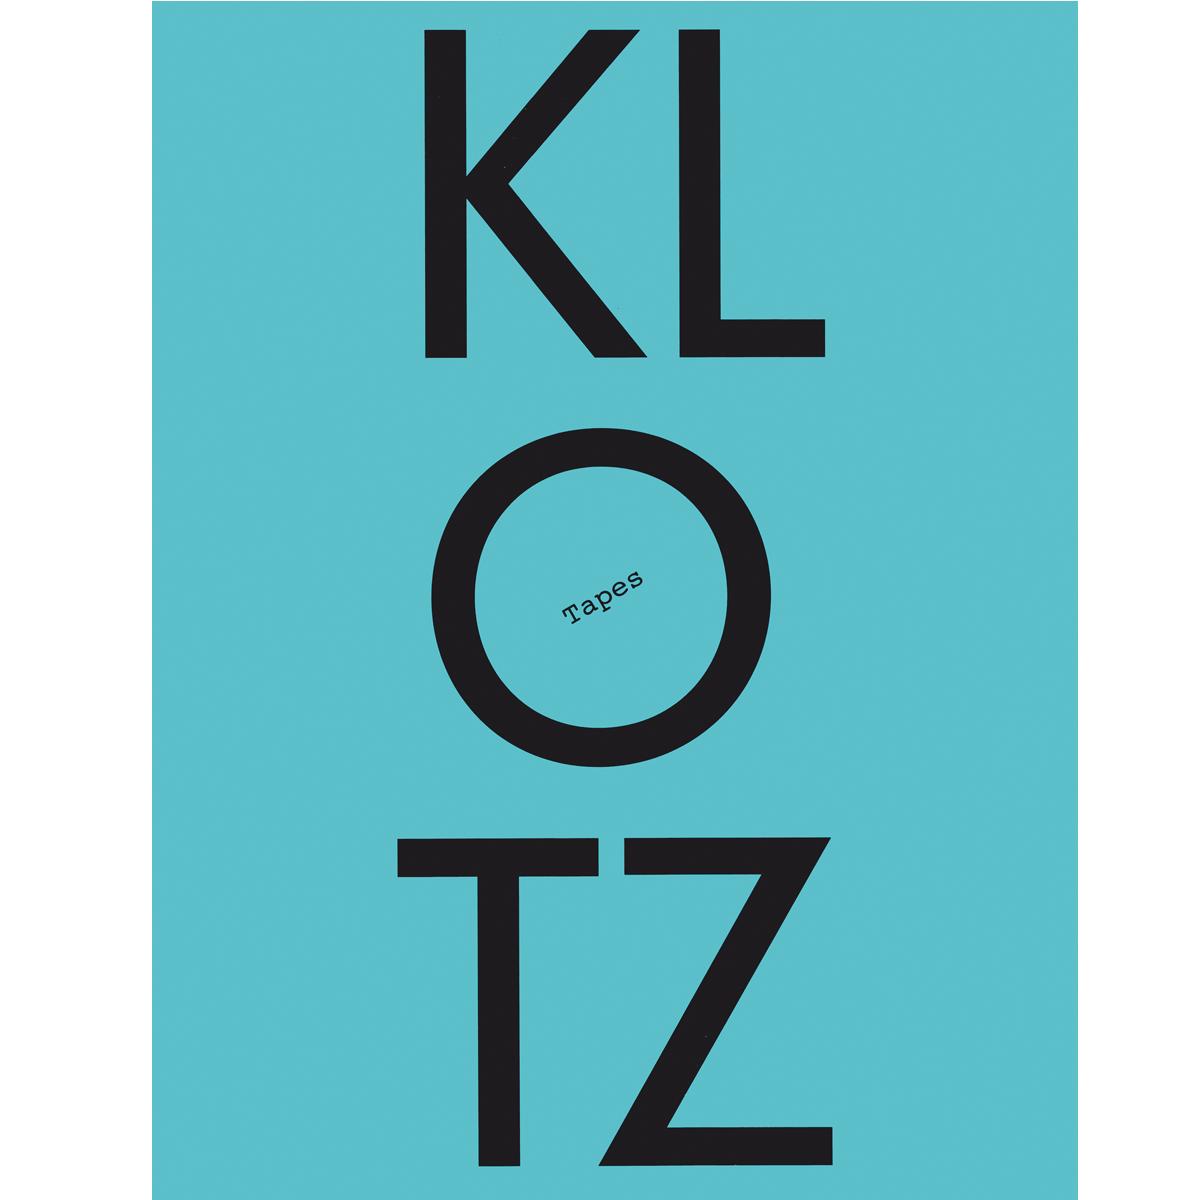 ARCH+: Die Klotz-Tapes